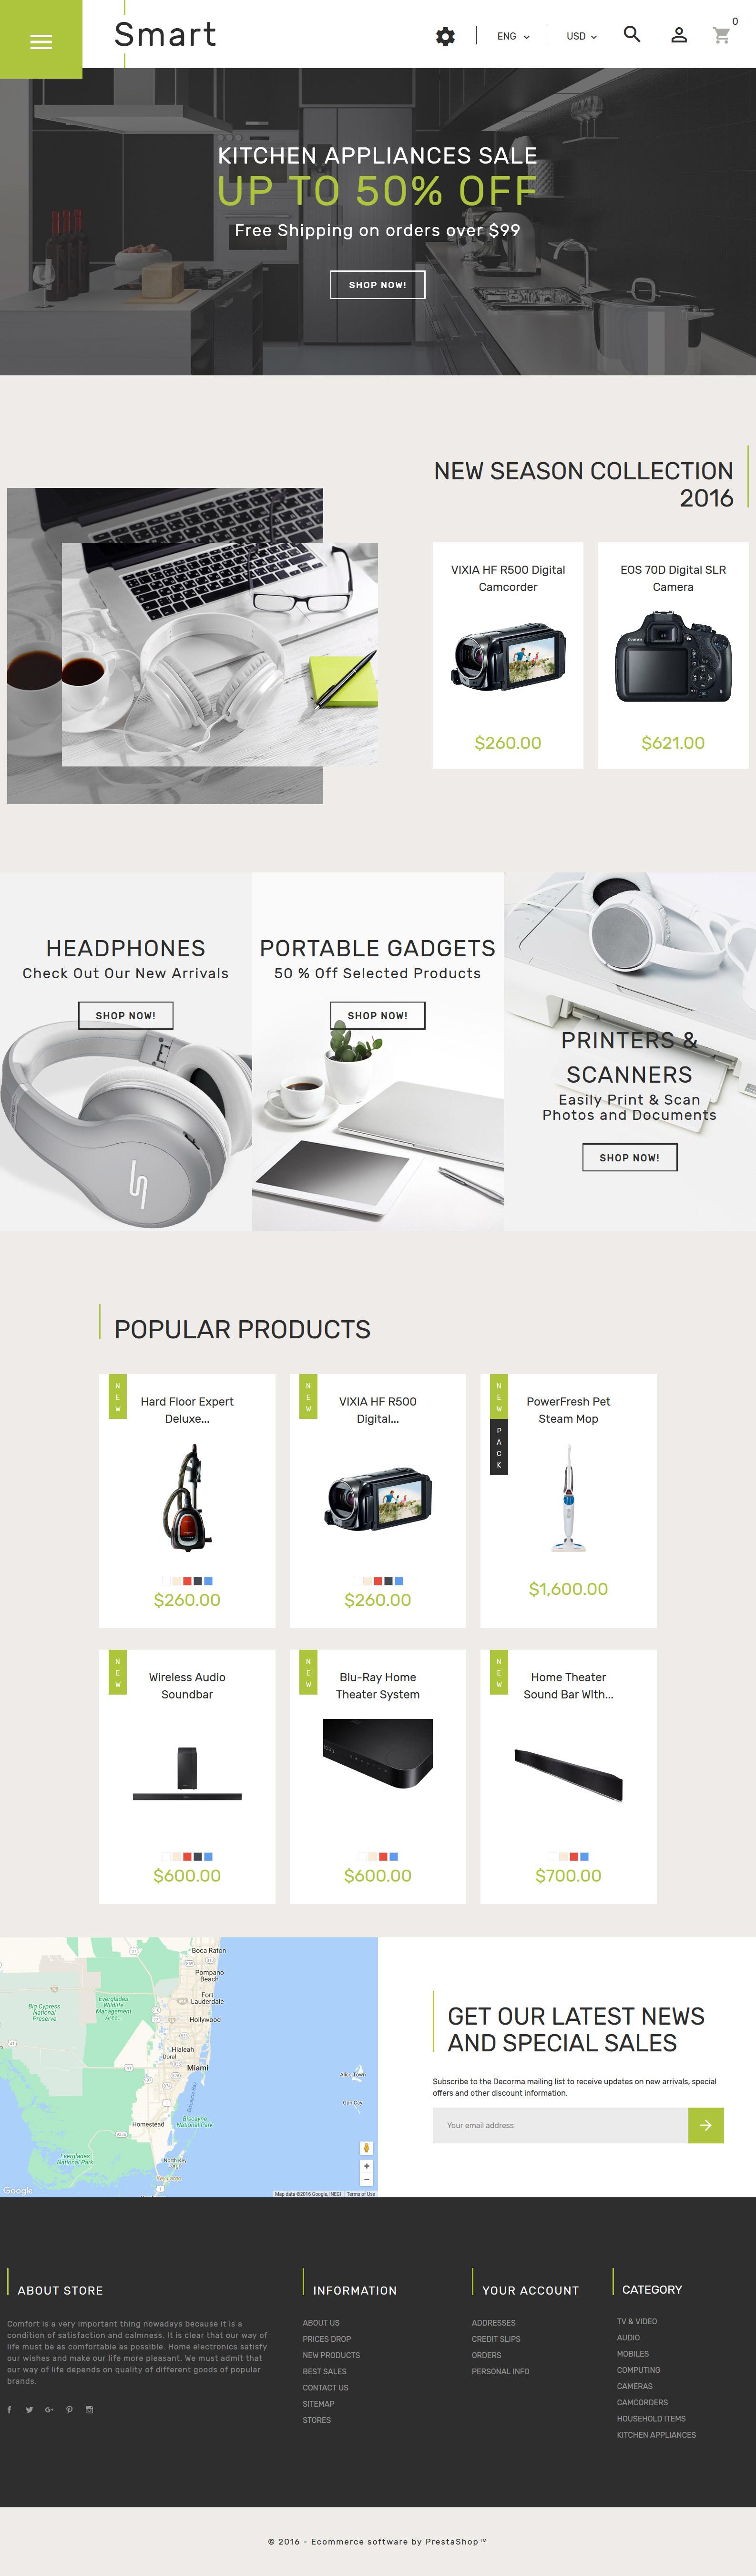 Smart - Gadgets & Electronics №61360 - скриншот